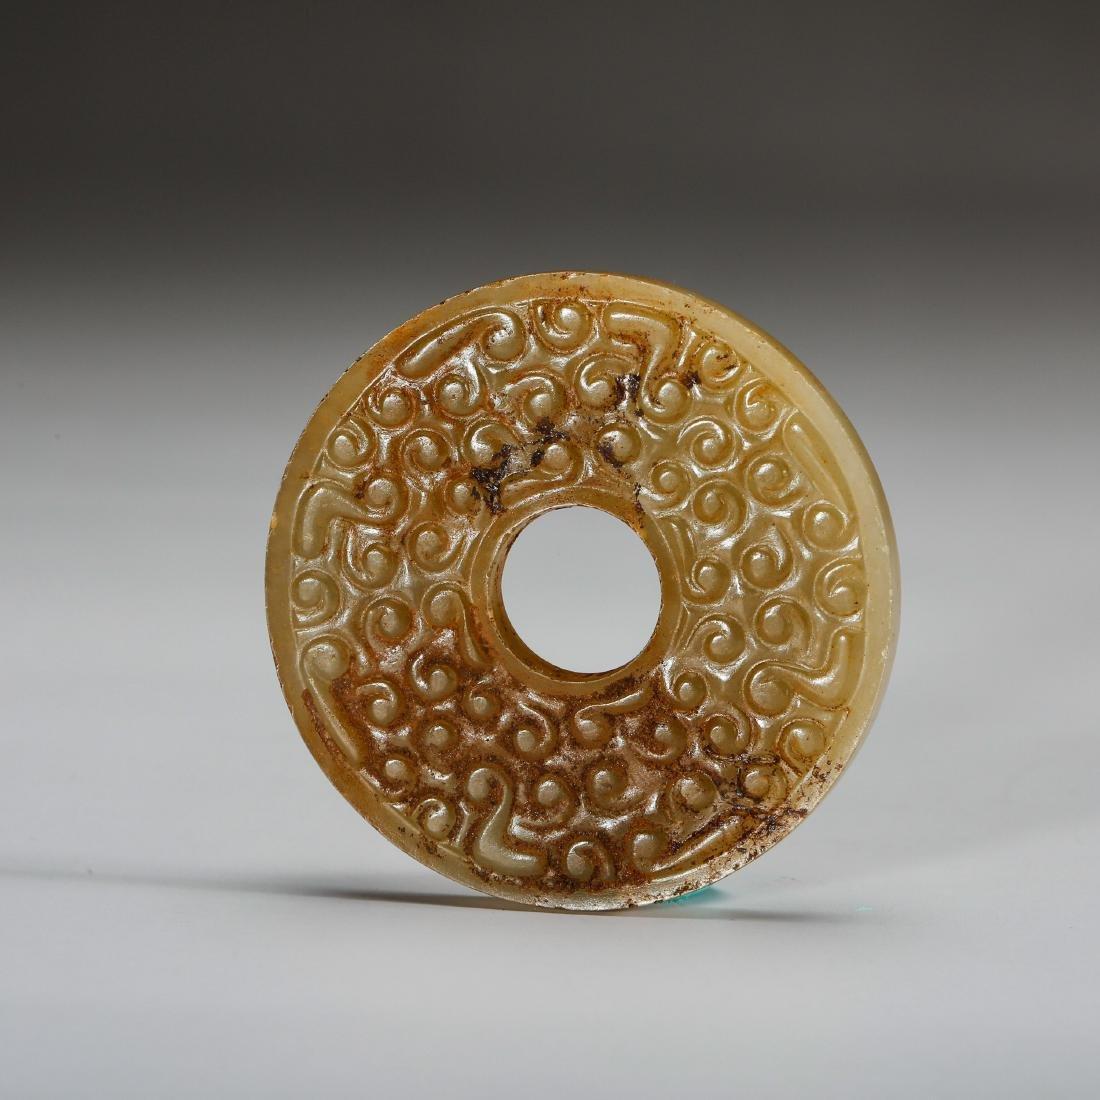 CHINESE ARCHAIC JADE BI DISK, HAN DYNASTY